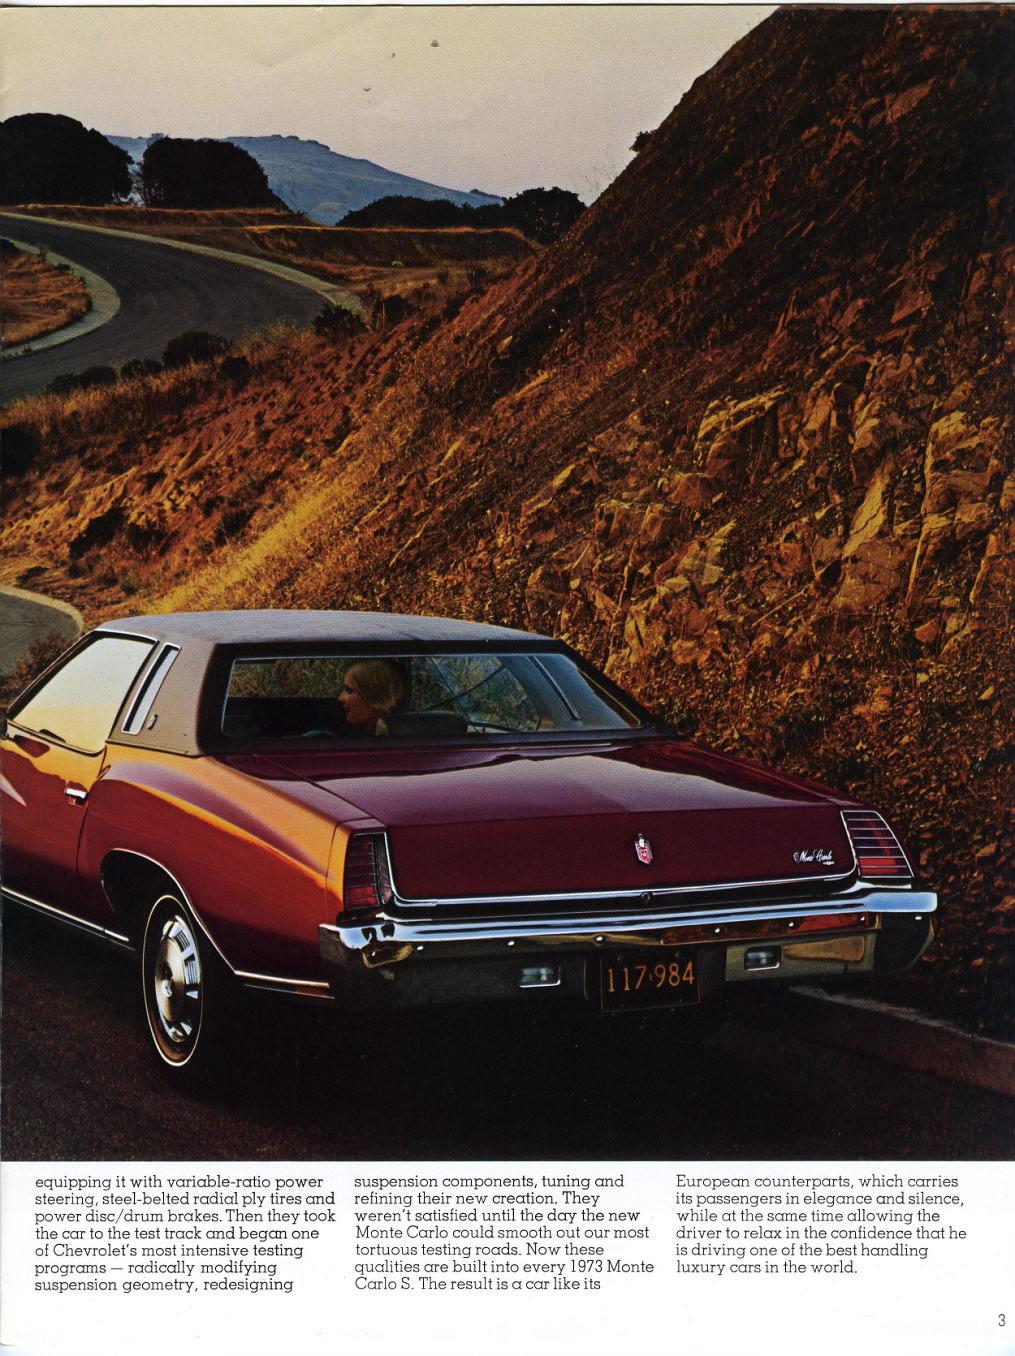 1973 chevrolet monte carlo brochure 39 73chevy. Black Bedroom Furniture Sets. Home Design Ideas